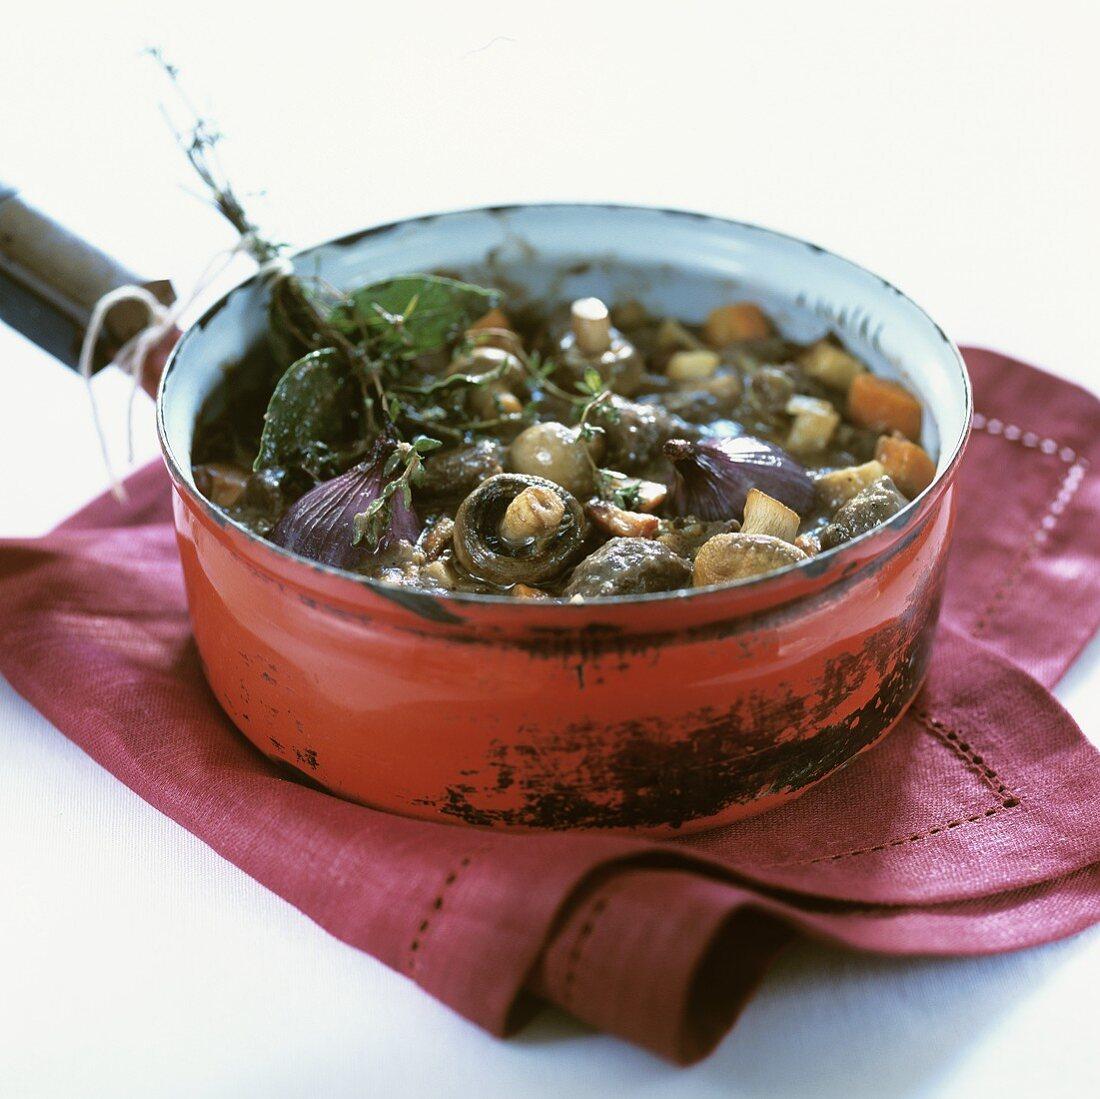 Beef and mushroom goulash in a pan